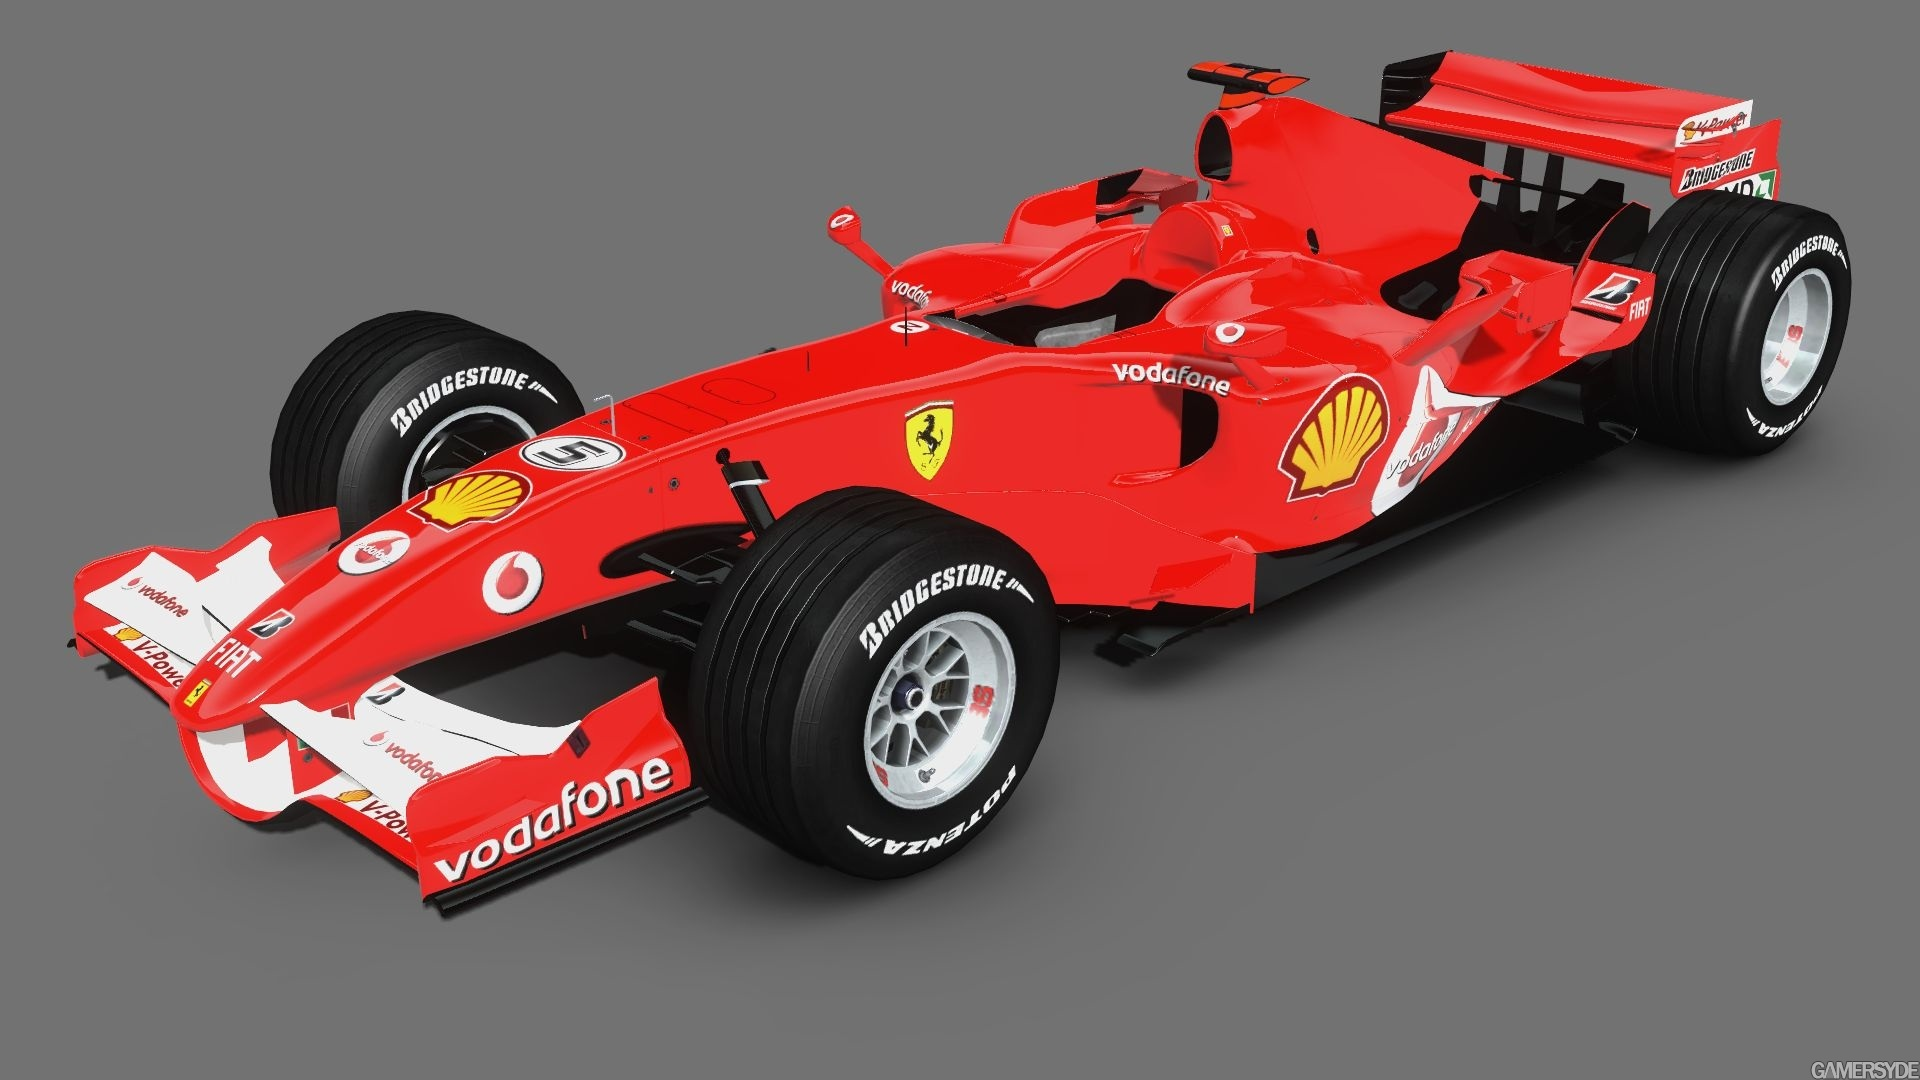 TD Ferrari Racing Legends : Car List Unveiled - Gamersyde